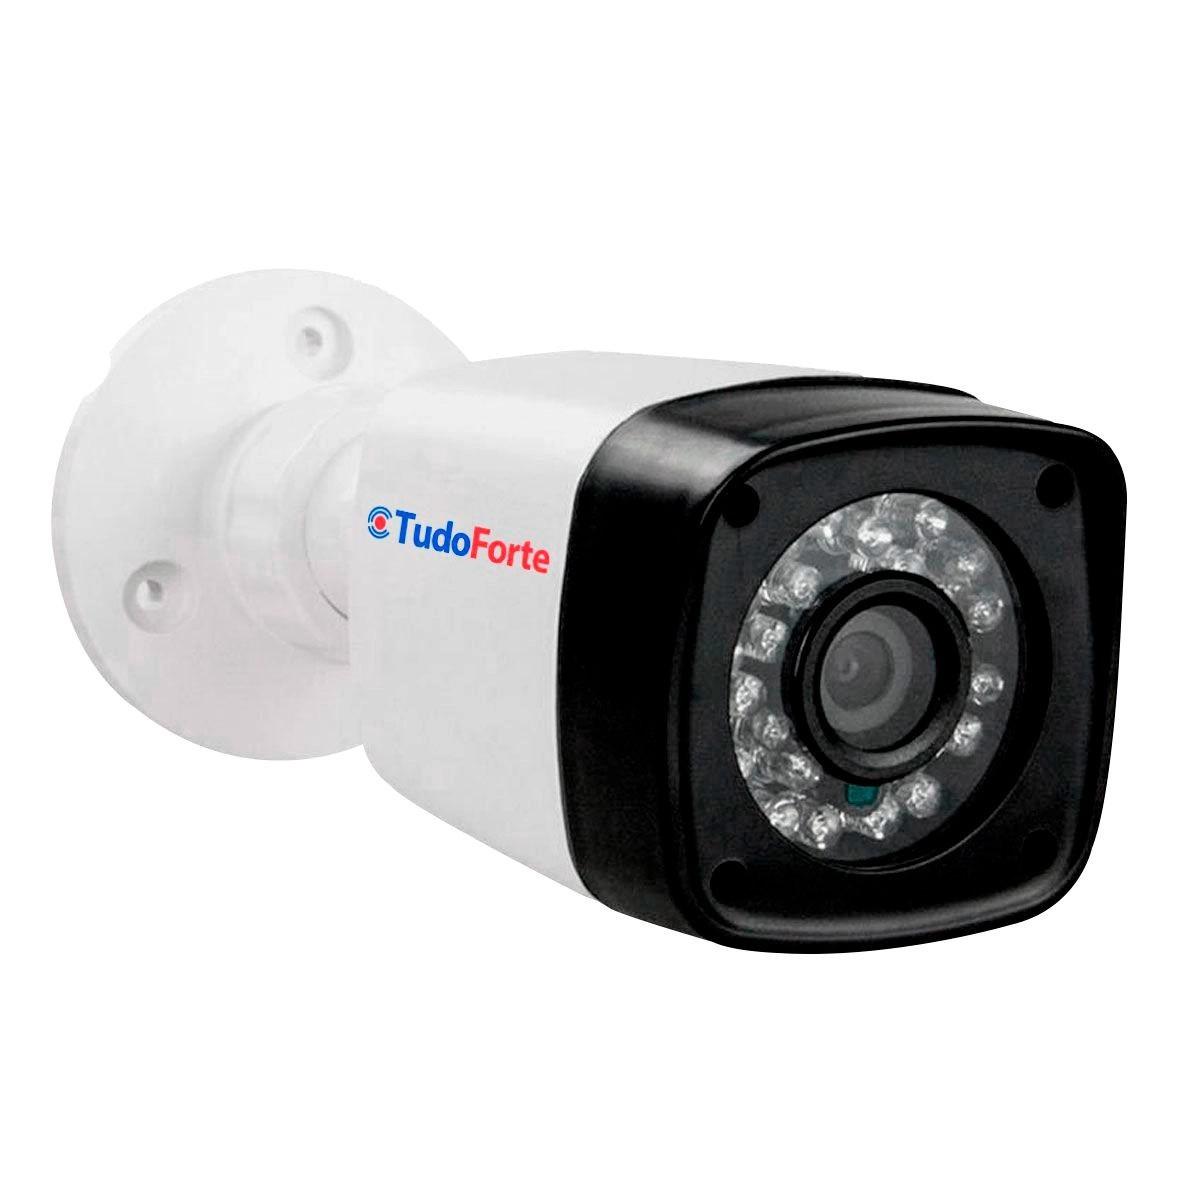 kit-porteiro-eletronico-ipr8010-intelbras-02-cameras-bullet-tudo-forte-tela-monitor-7-polegadas-lcd-colorido-acessorios-02